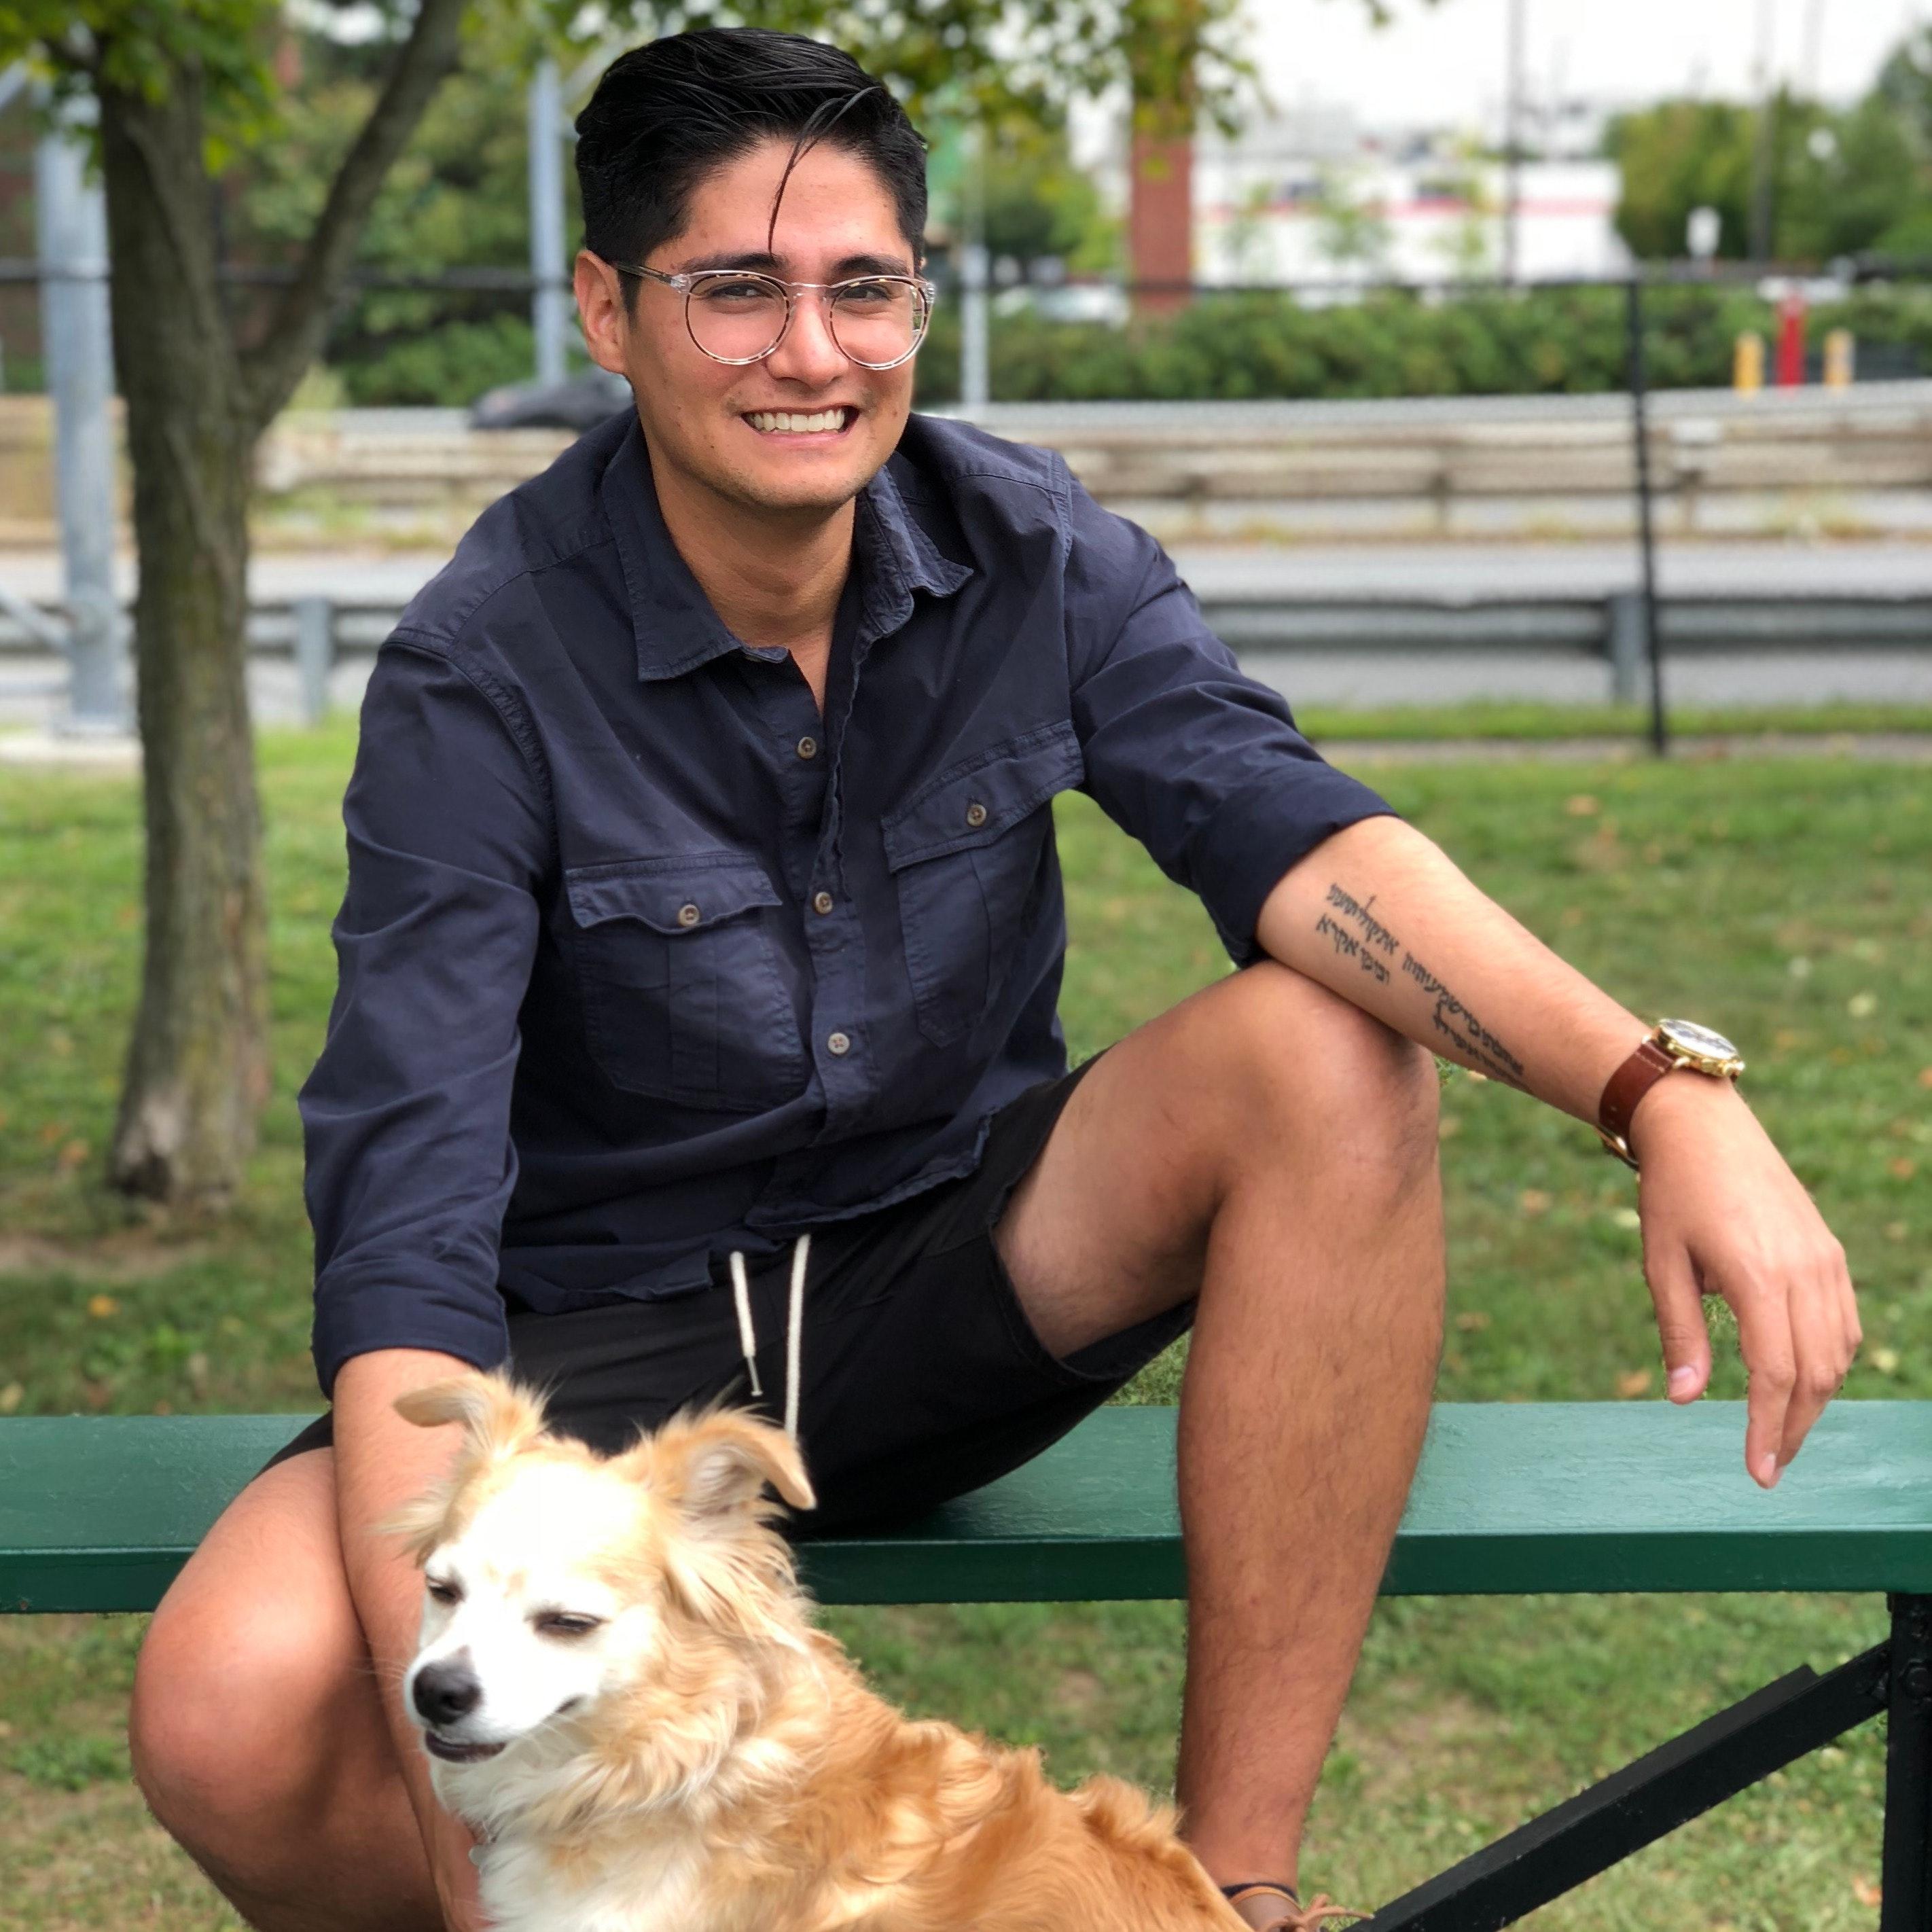 Jon-Paul & Claudia's dog day care